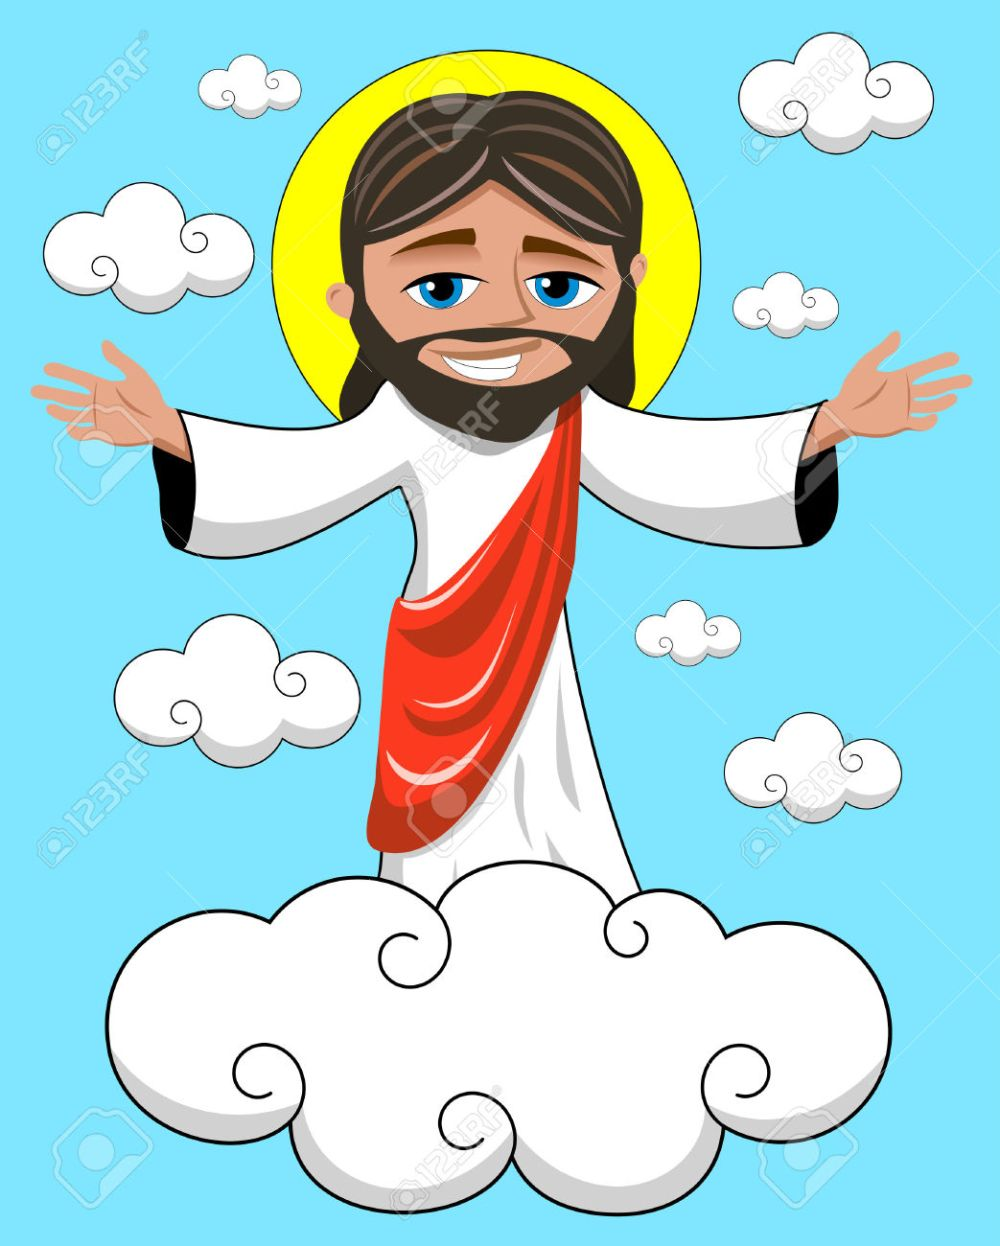 medium resolution of cartoon smiling jesus opens his hands in heavenly kingdom royalty